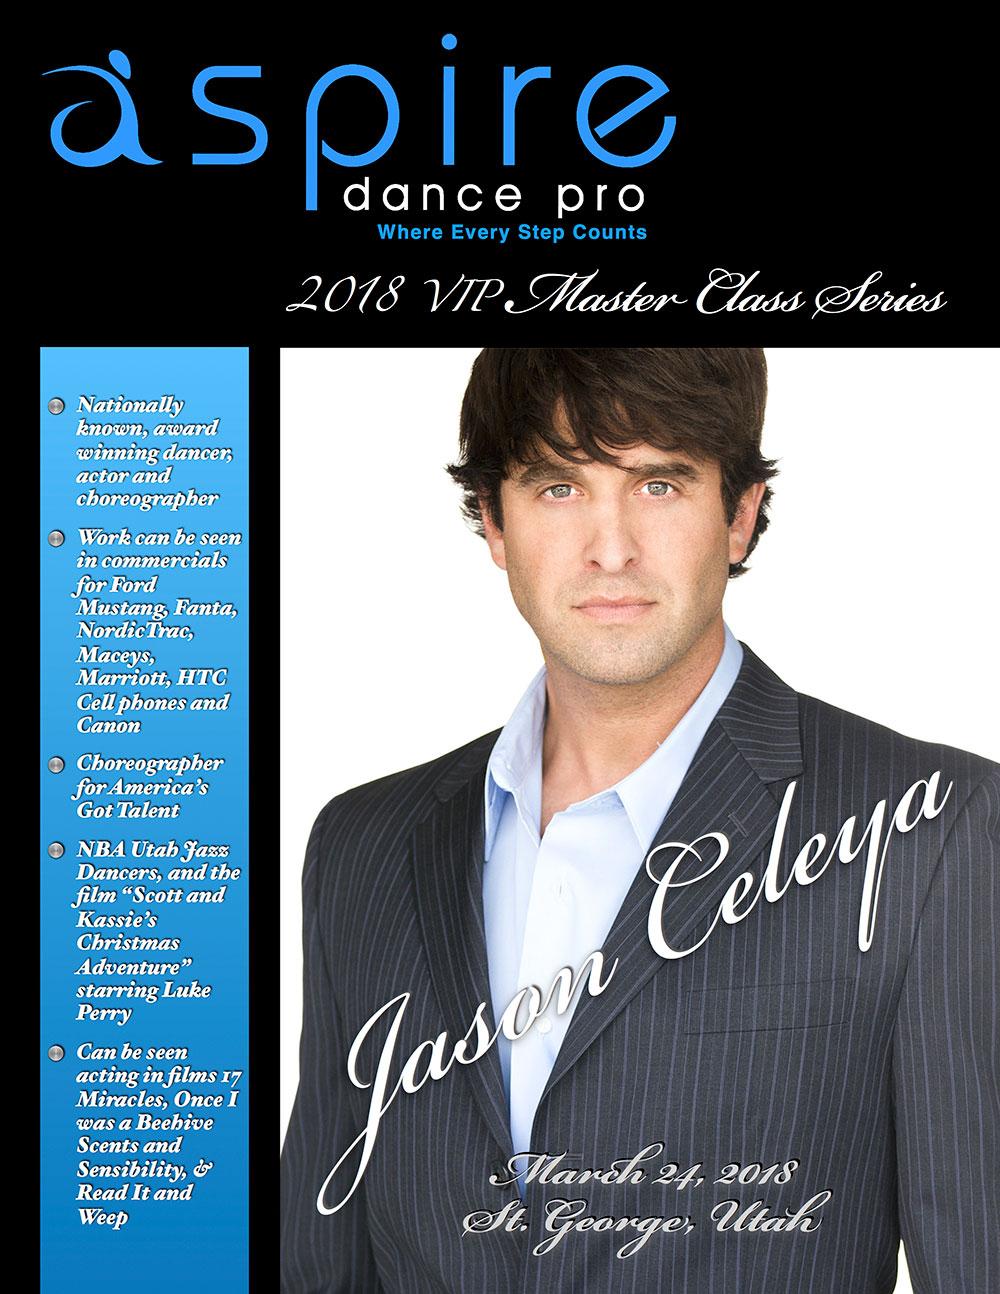 Jason Celaya - Aspire Dance Pro Competitions Masterclass Instructor